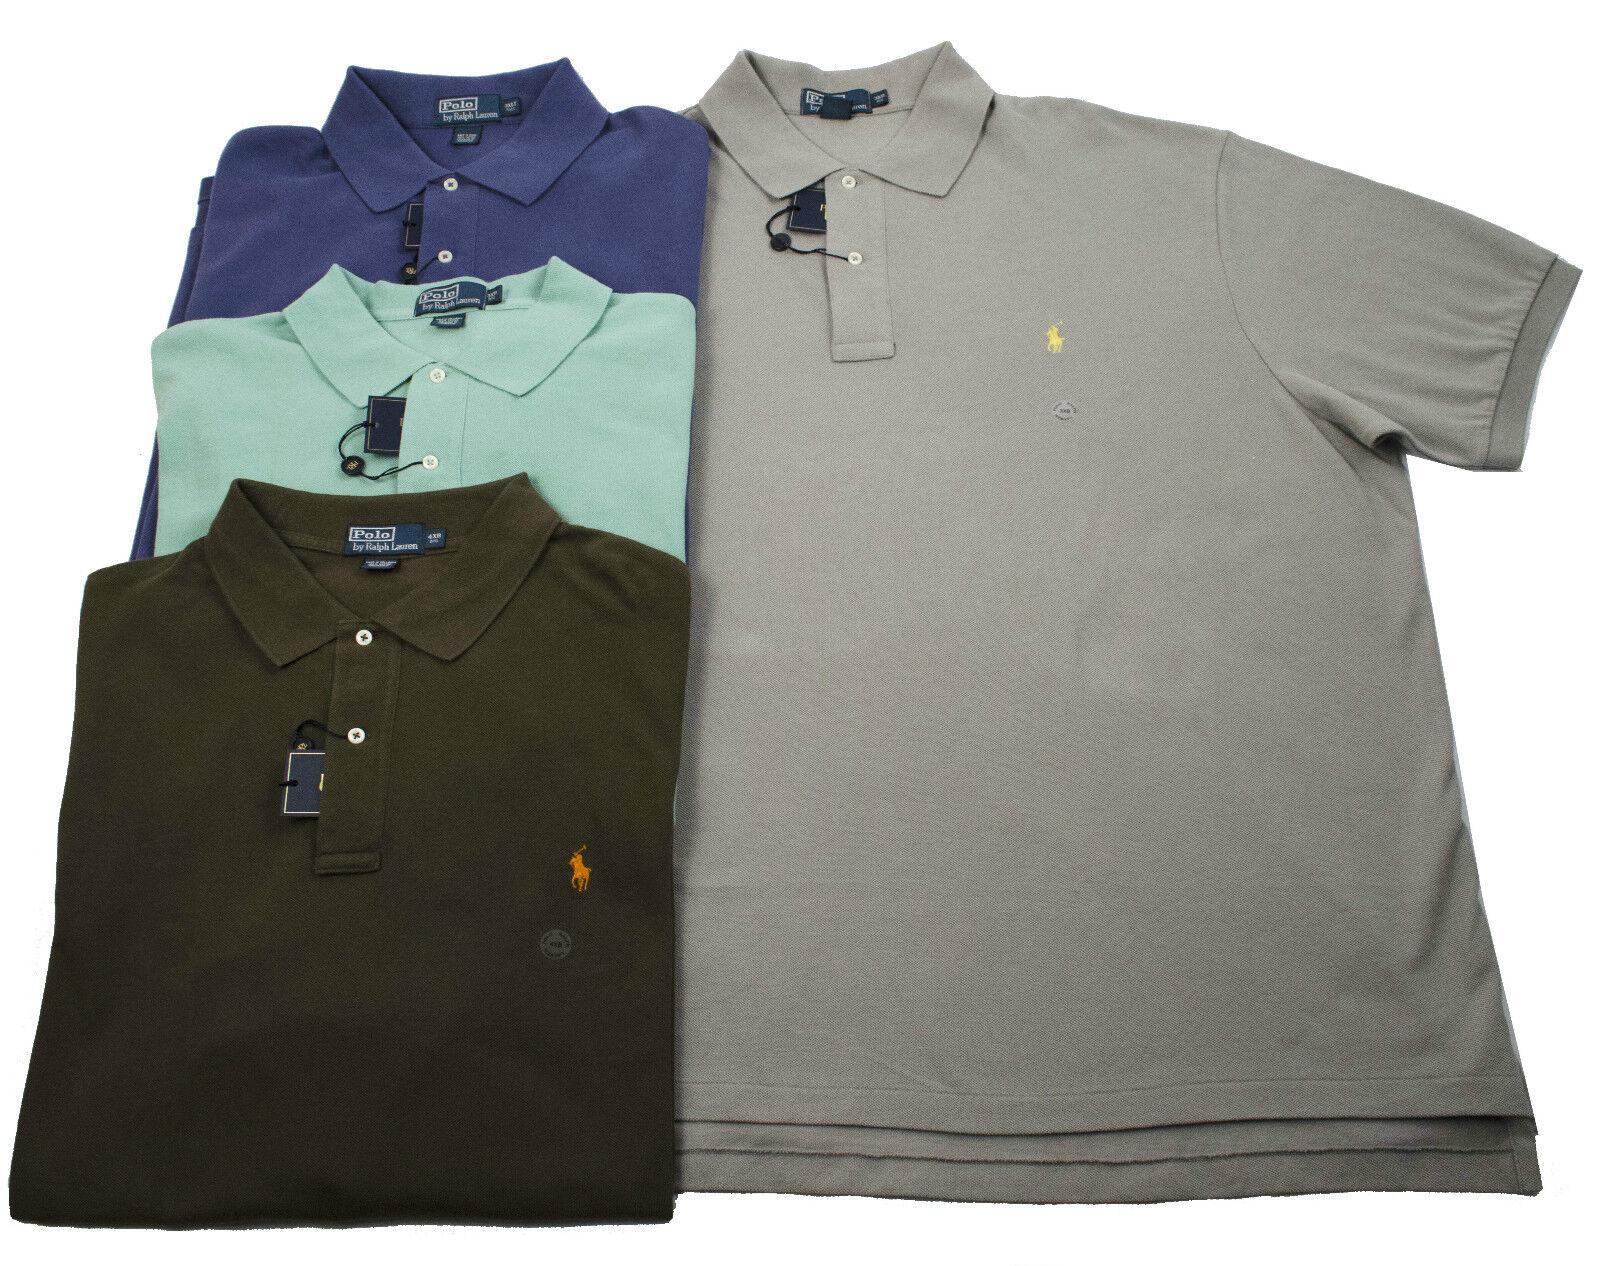 87397dd35 4XLT POLO RALPH LAUREN MESH BIG TALL MEN S SHORT SLEEVE PONY GREEN SHIRTS  3XB nejdlw1881-Casual Shirts   Tops